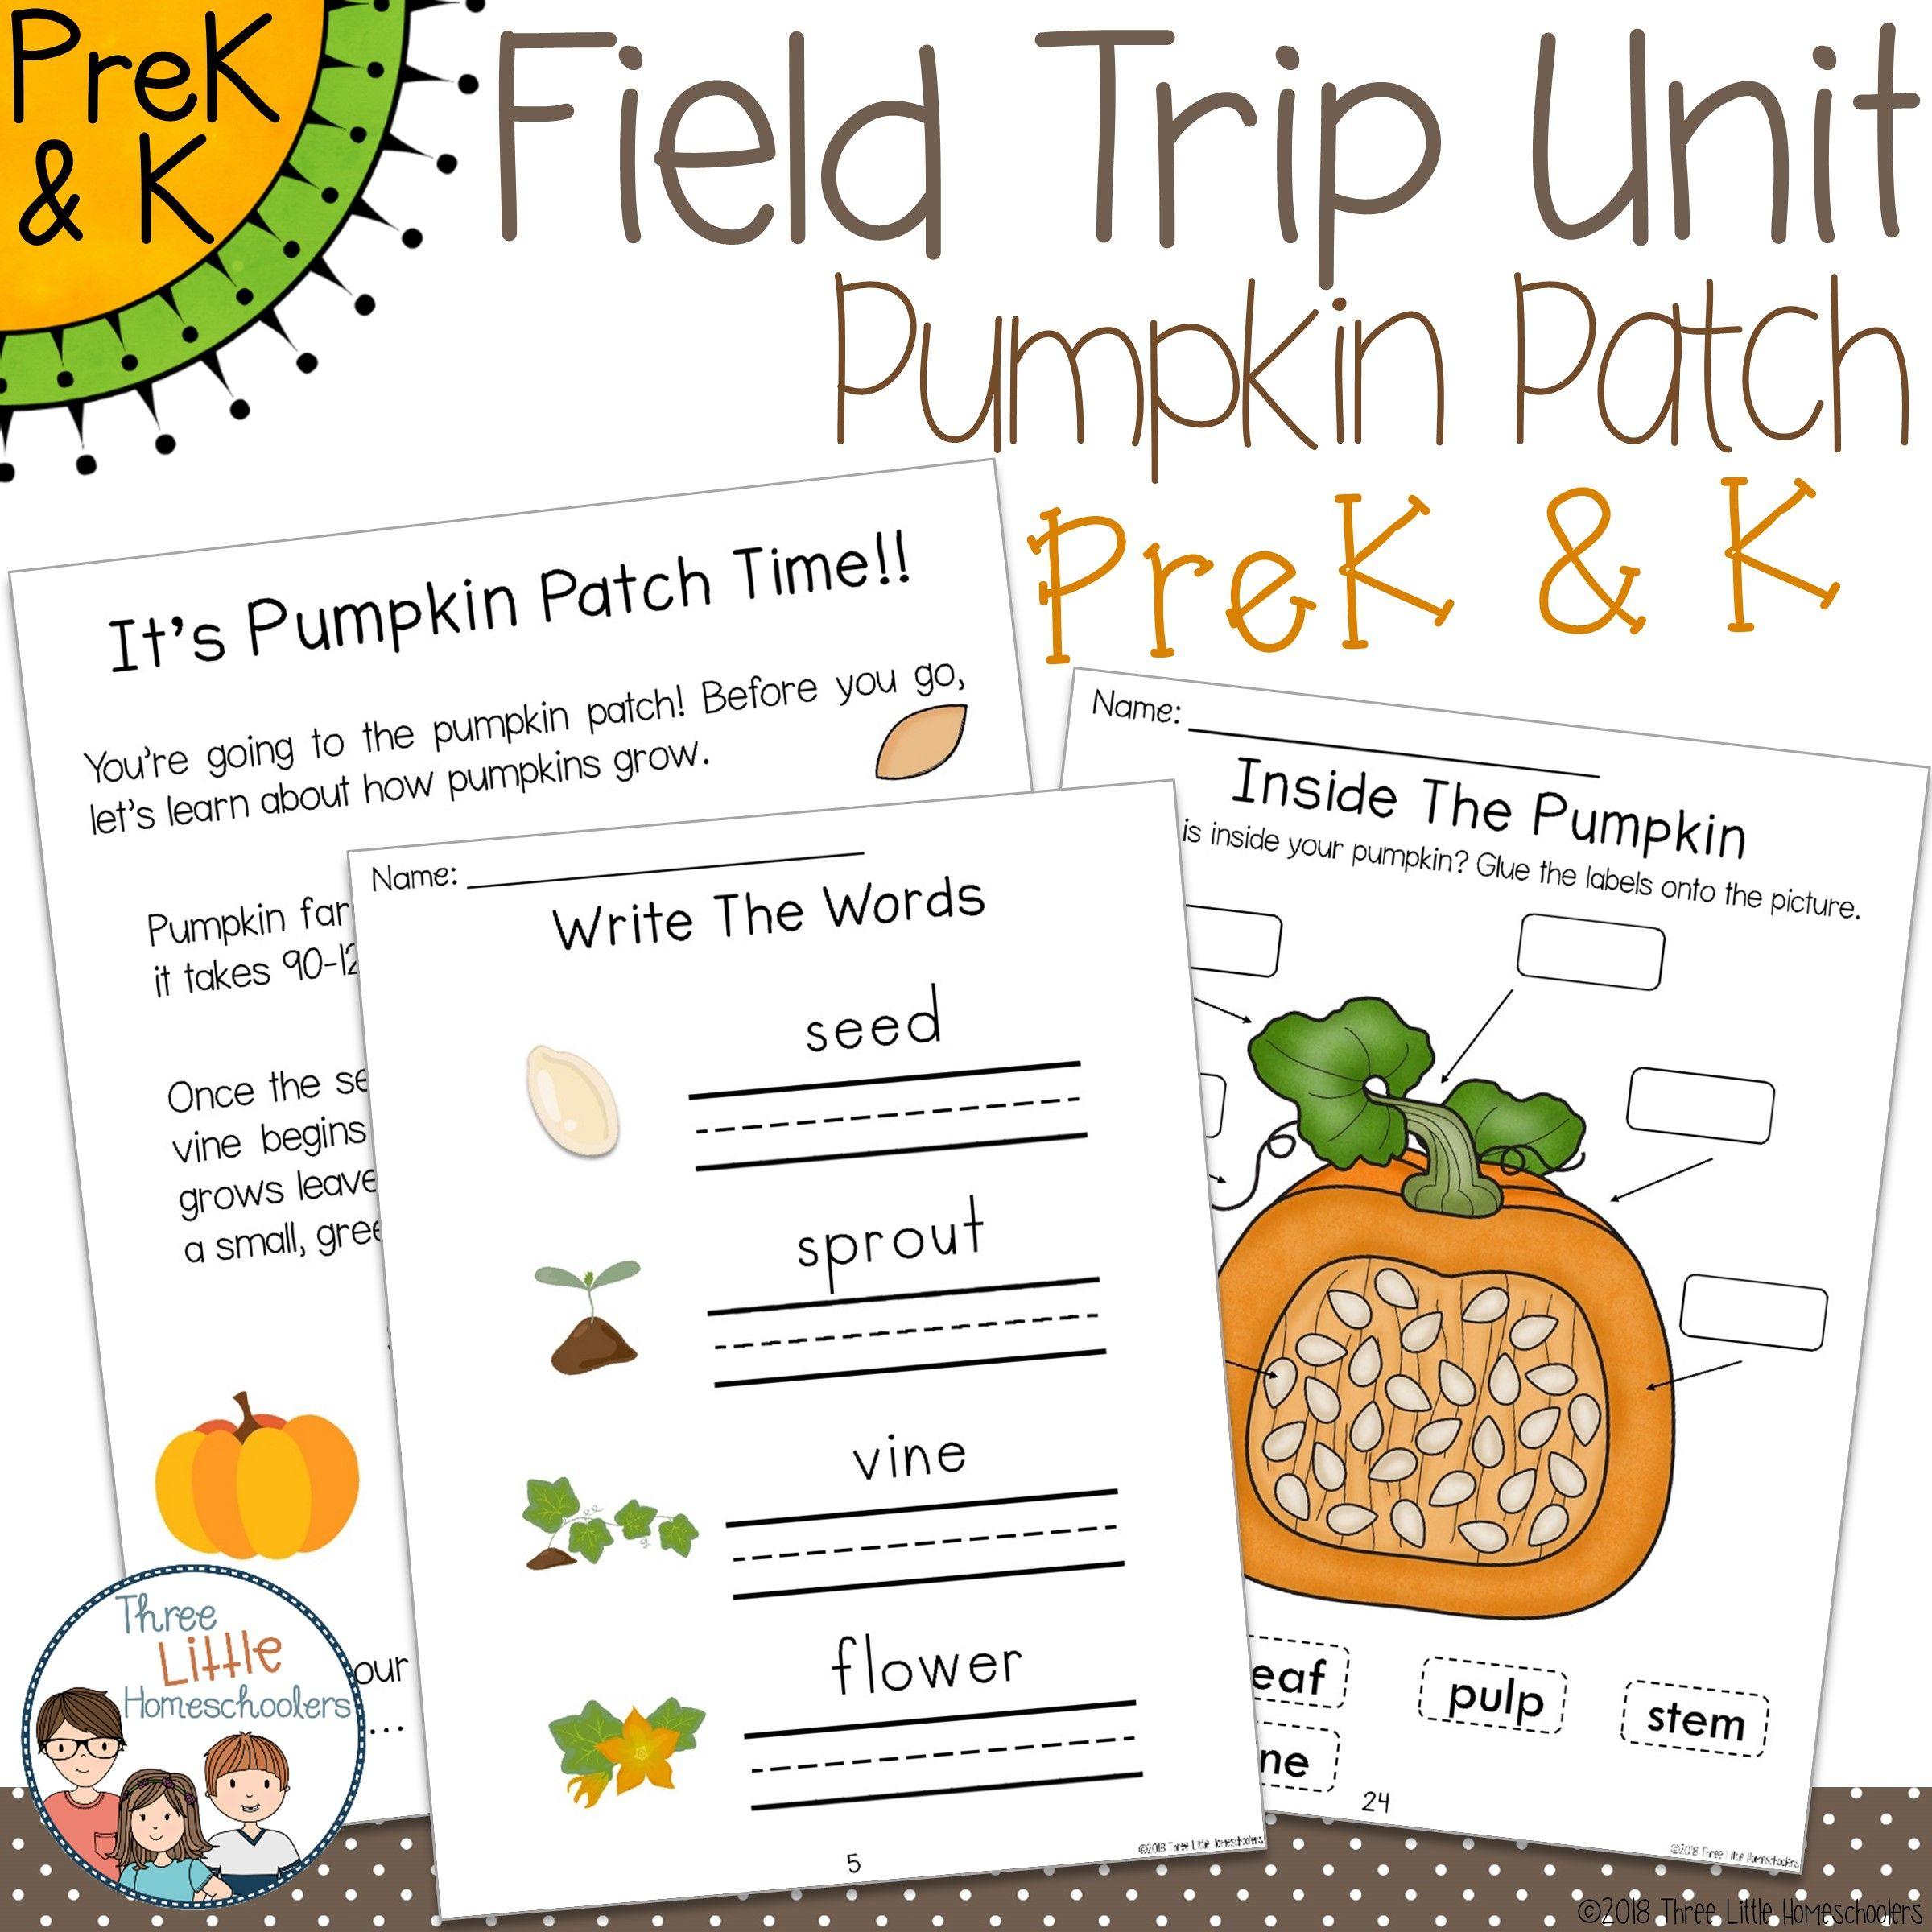 Pumpkin Patch Field Trip Unit